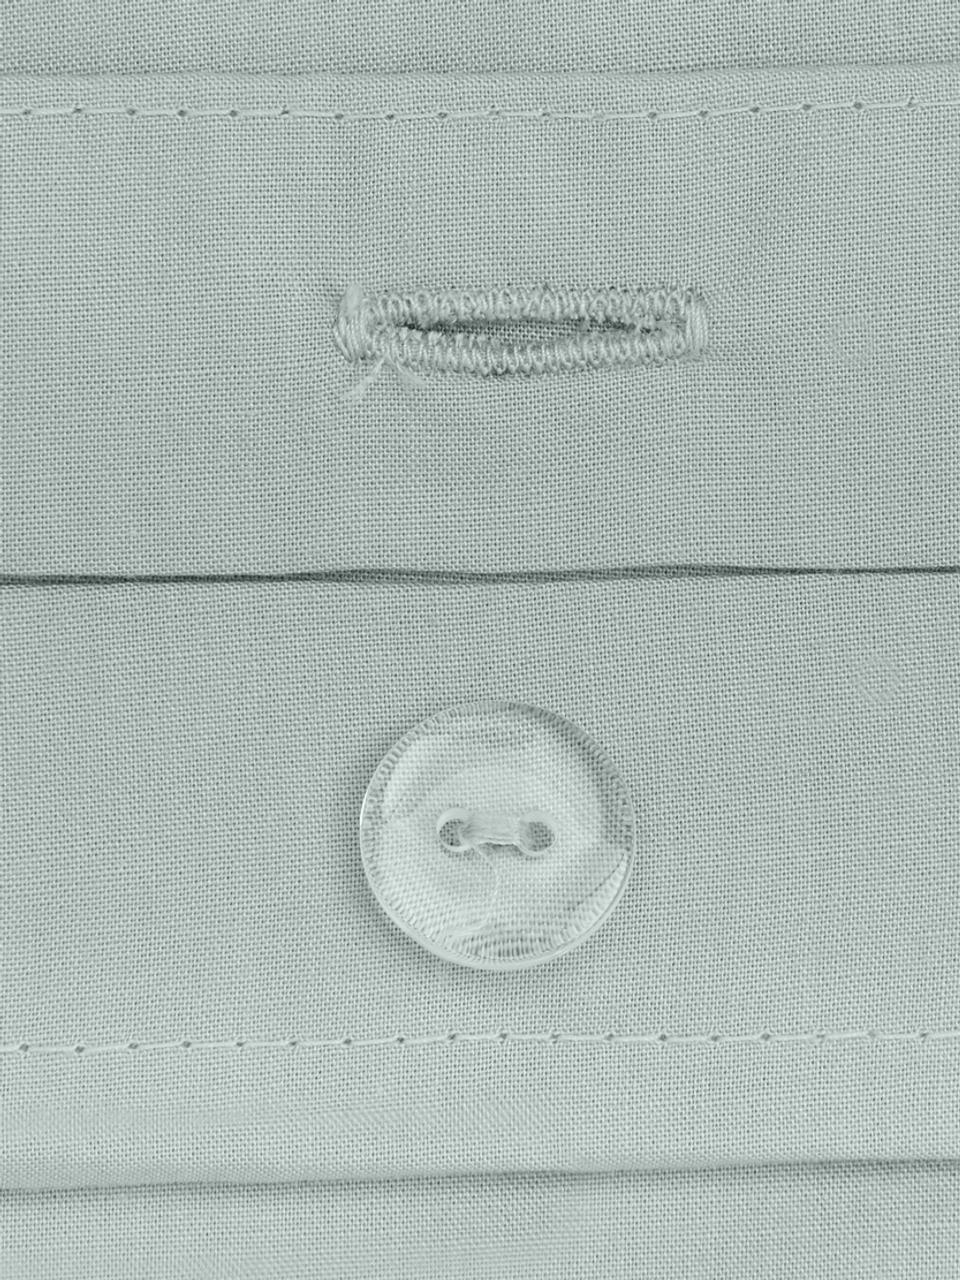 Baumwollperkal-Bettwäsche Elsie in Salbeigrün, Webart: Perkal Fadendichte 200 TC, Salbeigrün, 135 x 200 cm + 1 Kissen 80 x 80 cm